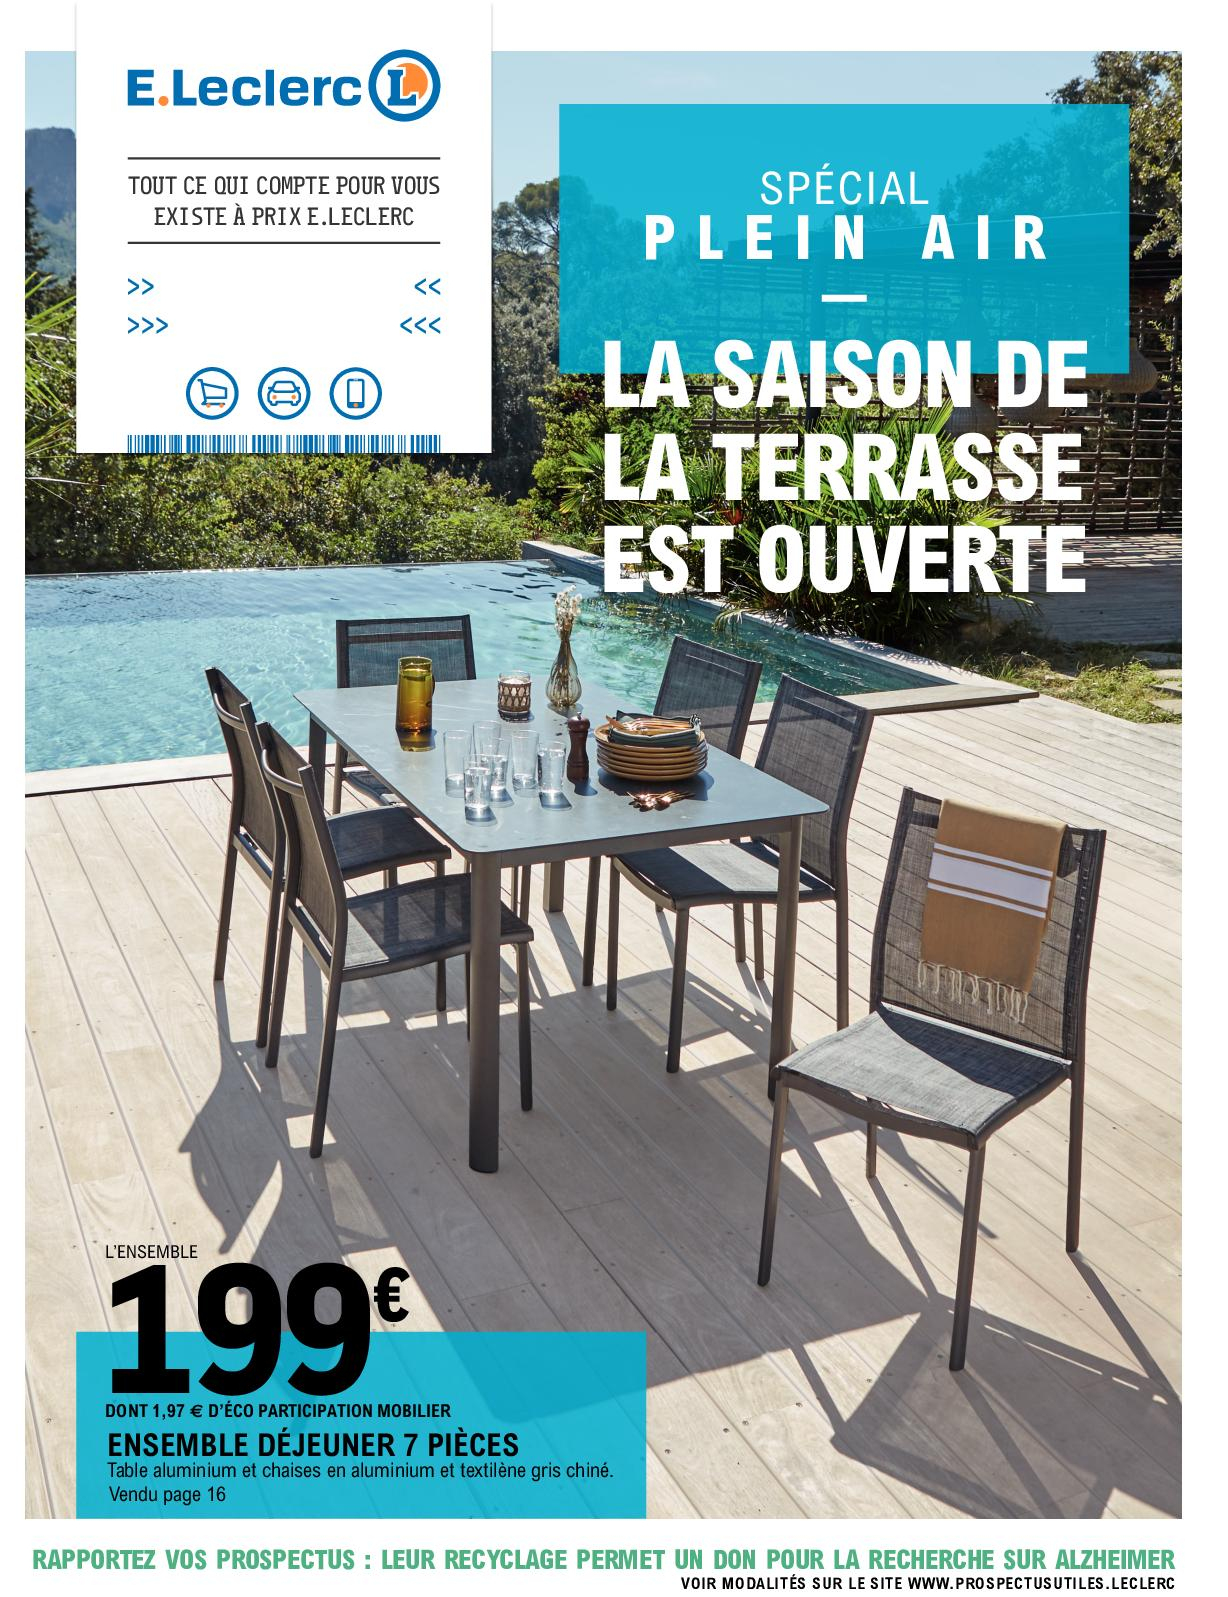 Calaméo - Plein Air 2020 _ Ic Et Saint Brevin (44) concernant Table Ronde Teck Leclerc